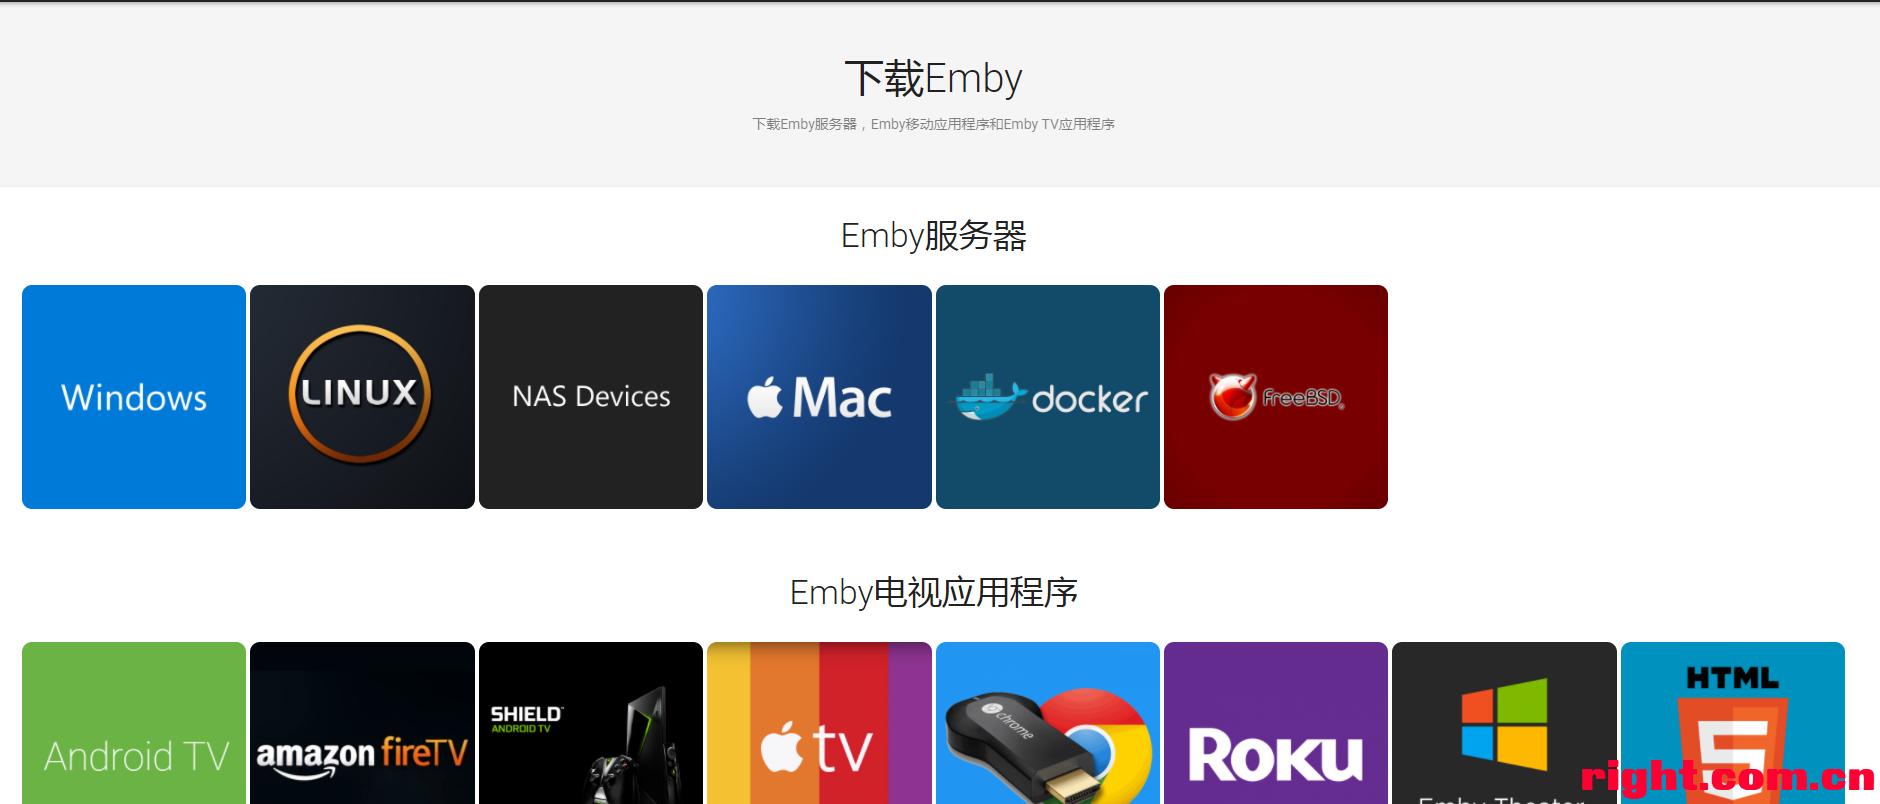 N1能不能装emby服务器,有没有大神知道| 恩山无线论坛